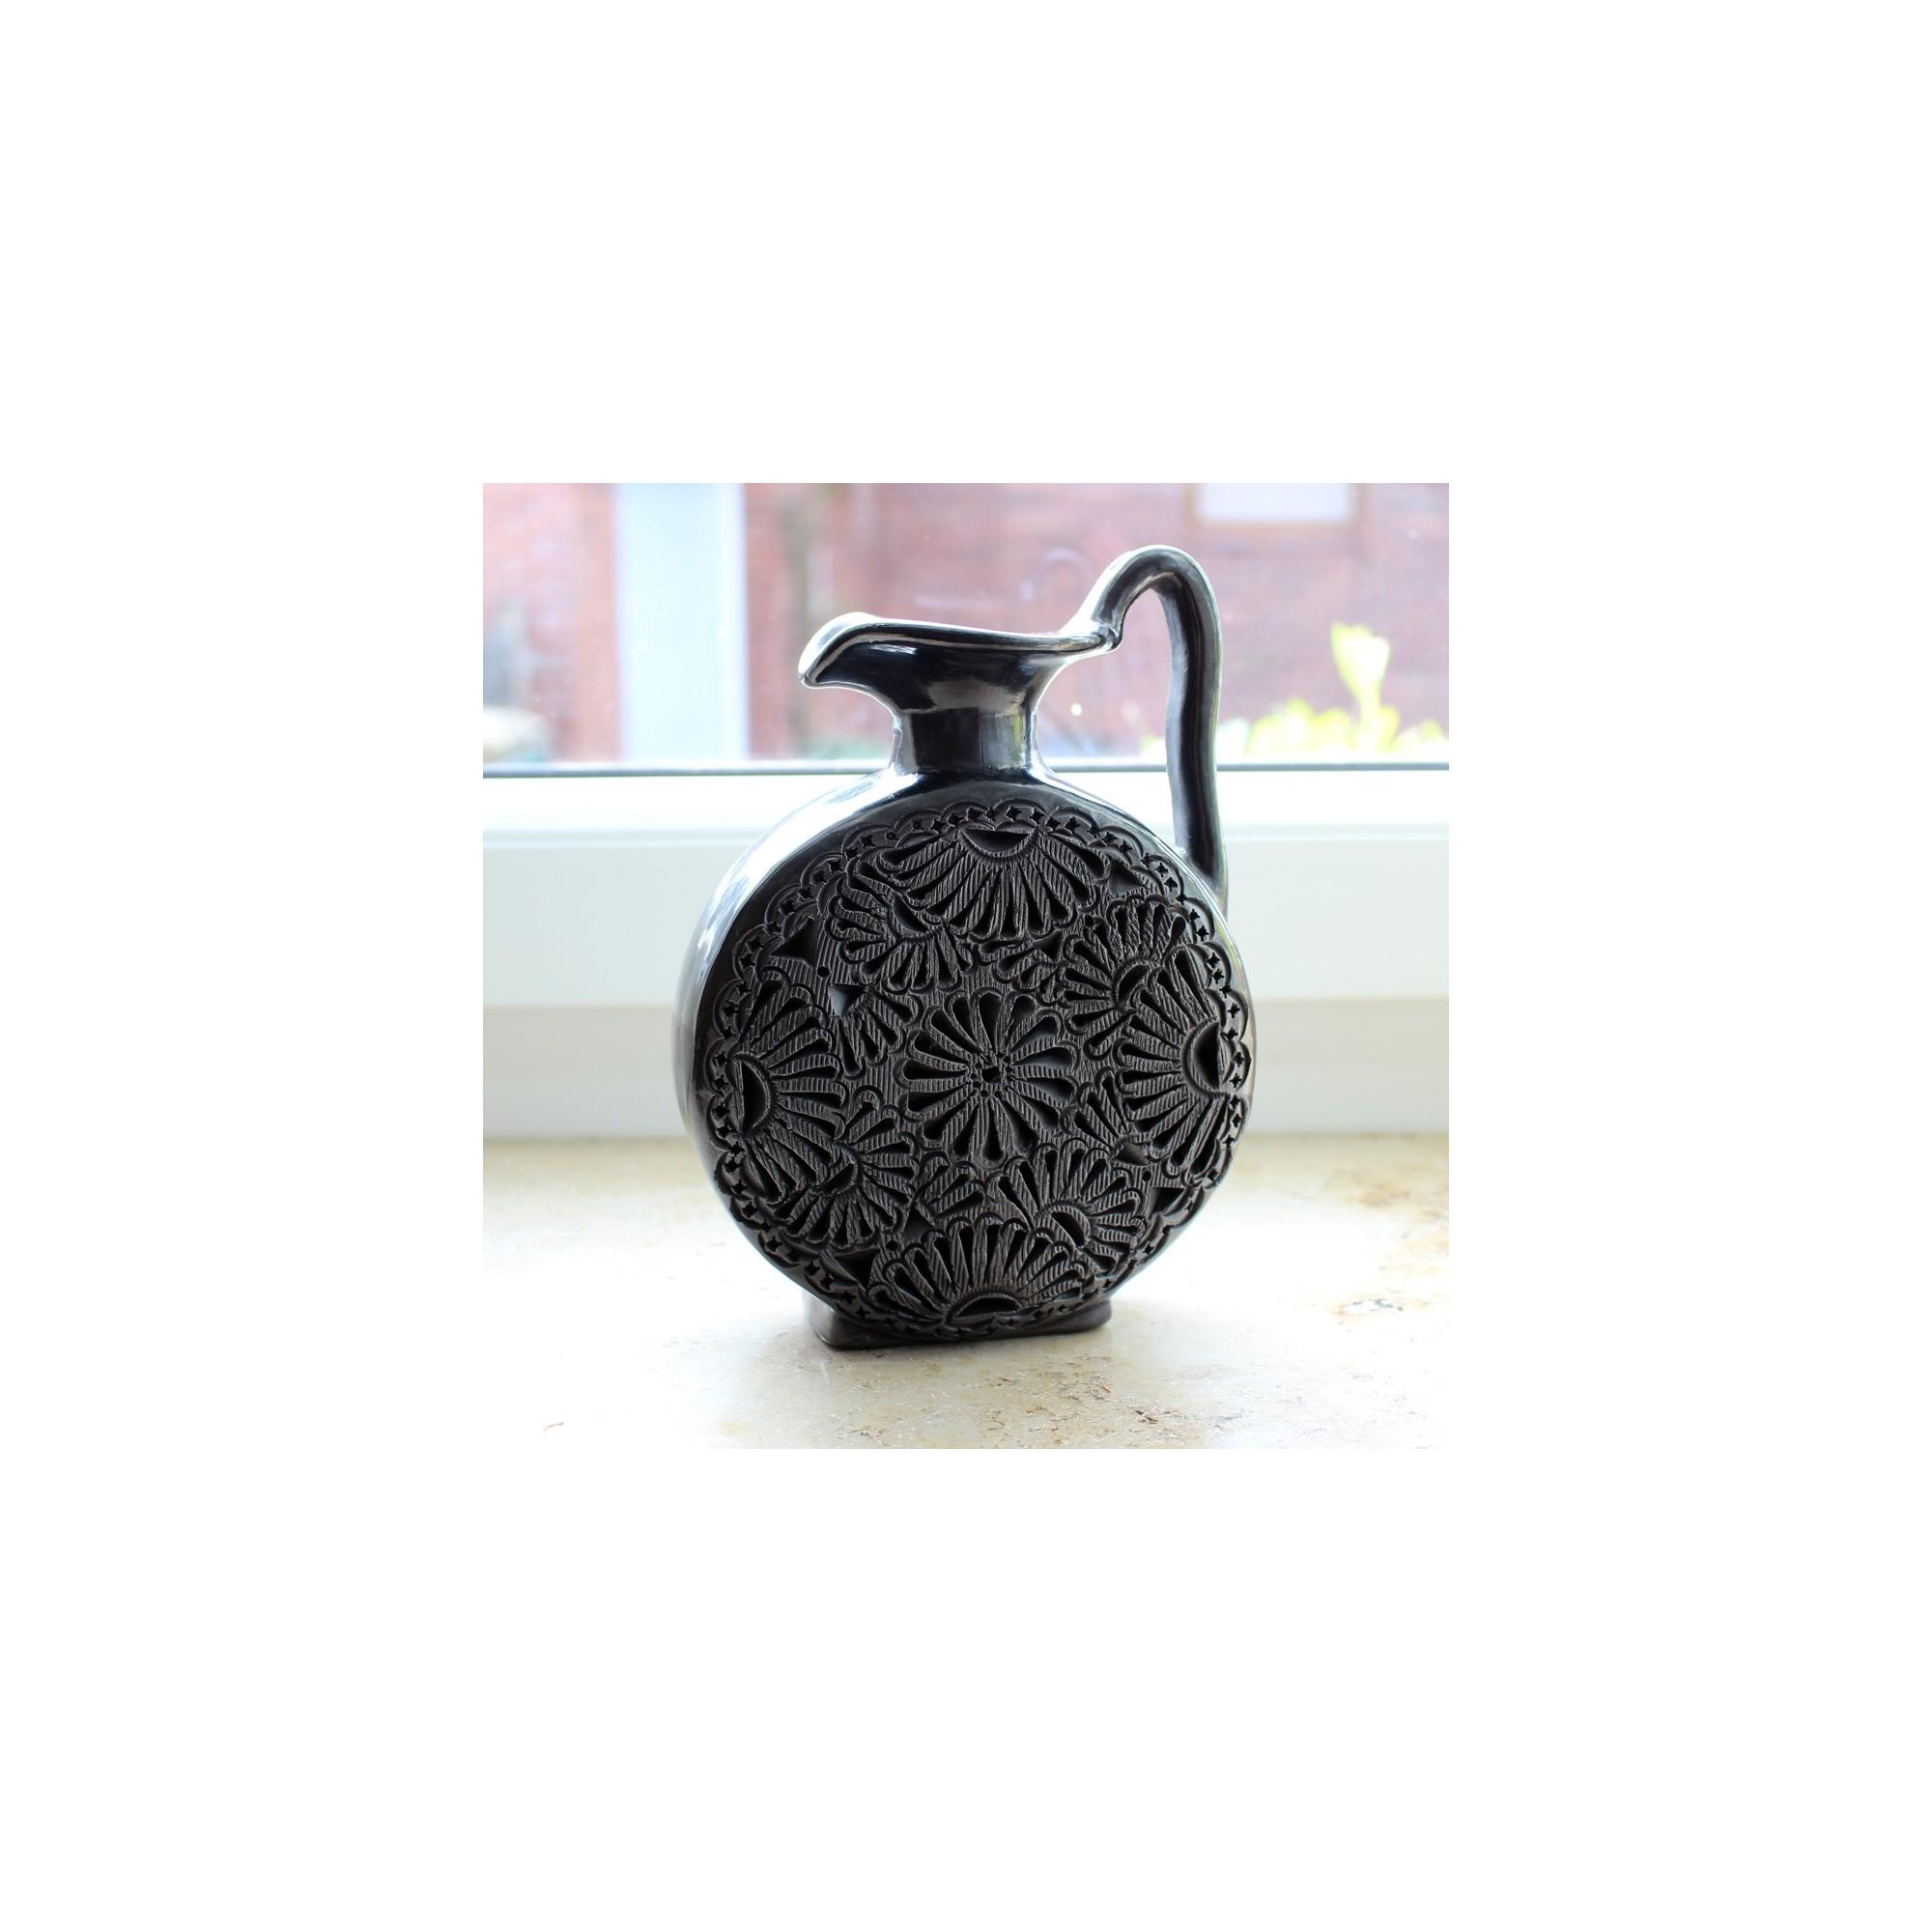 schwarze keramik krug solecito deko blumenvase kaufen. Black Bedroom Furniture Sets. Home Design Ideas